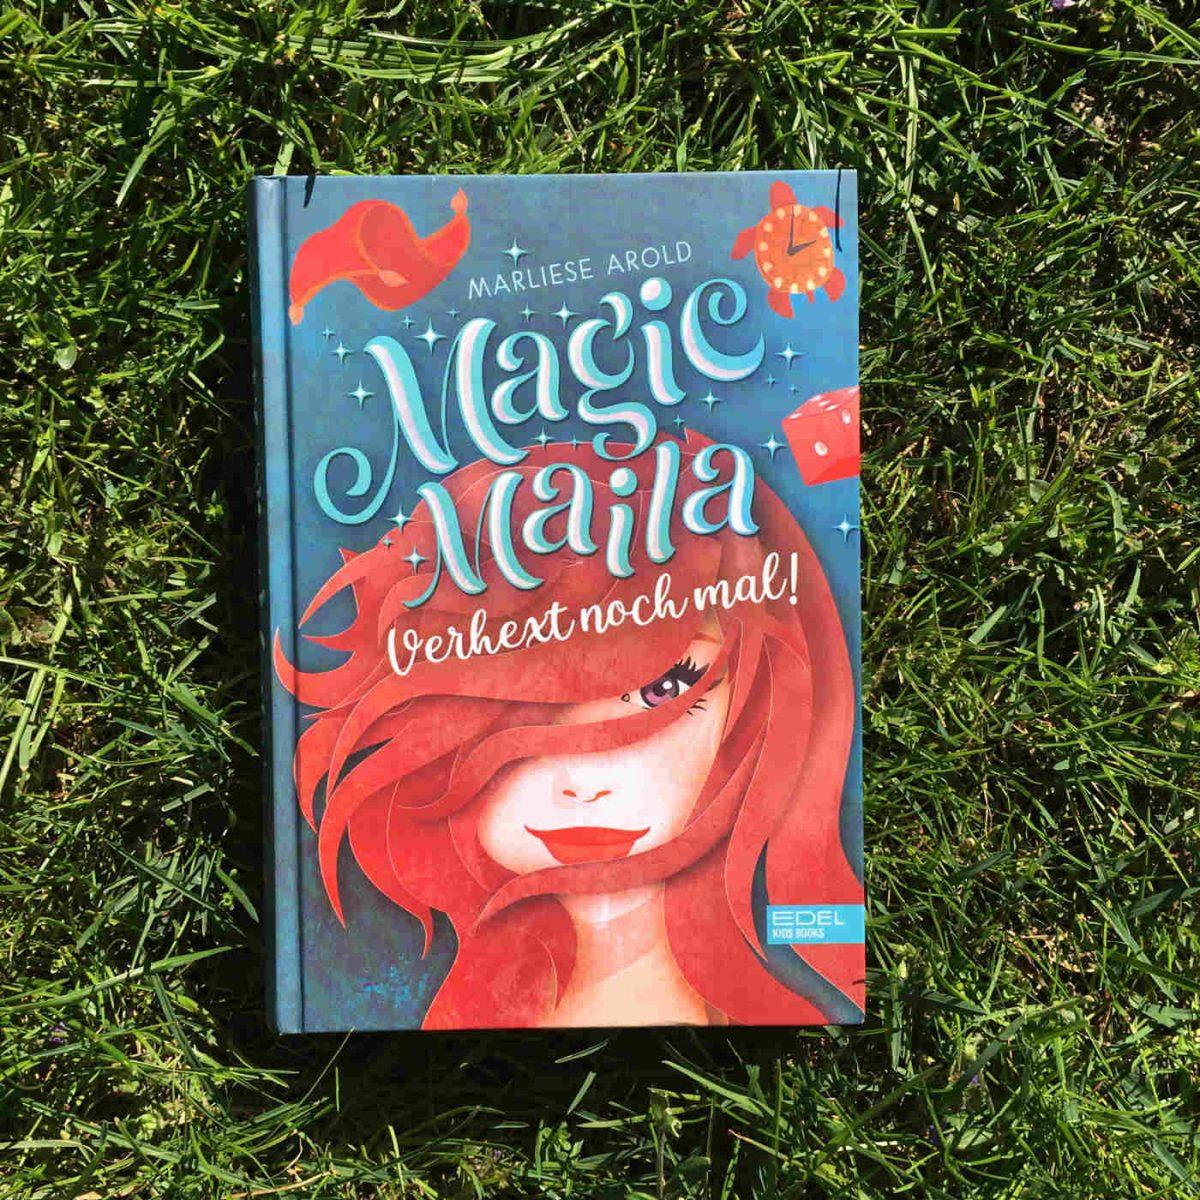 Marliese Arold: Magic Maila, verhext noch mal!